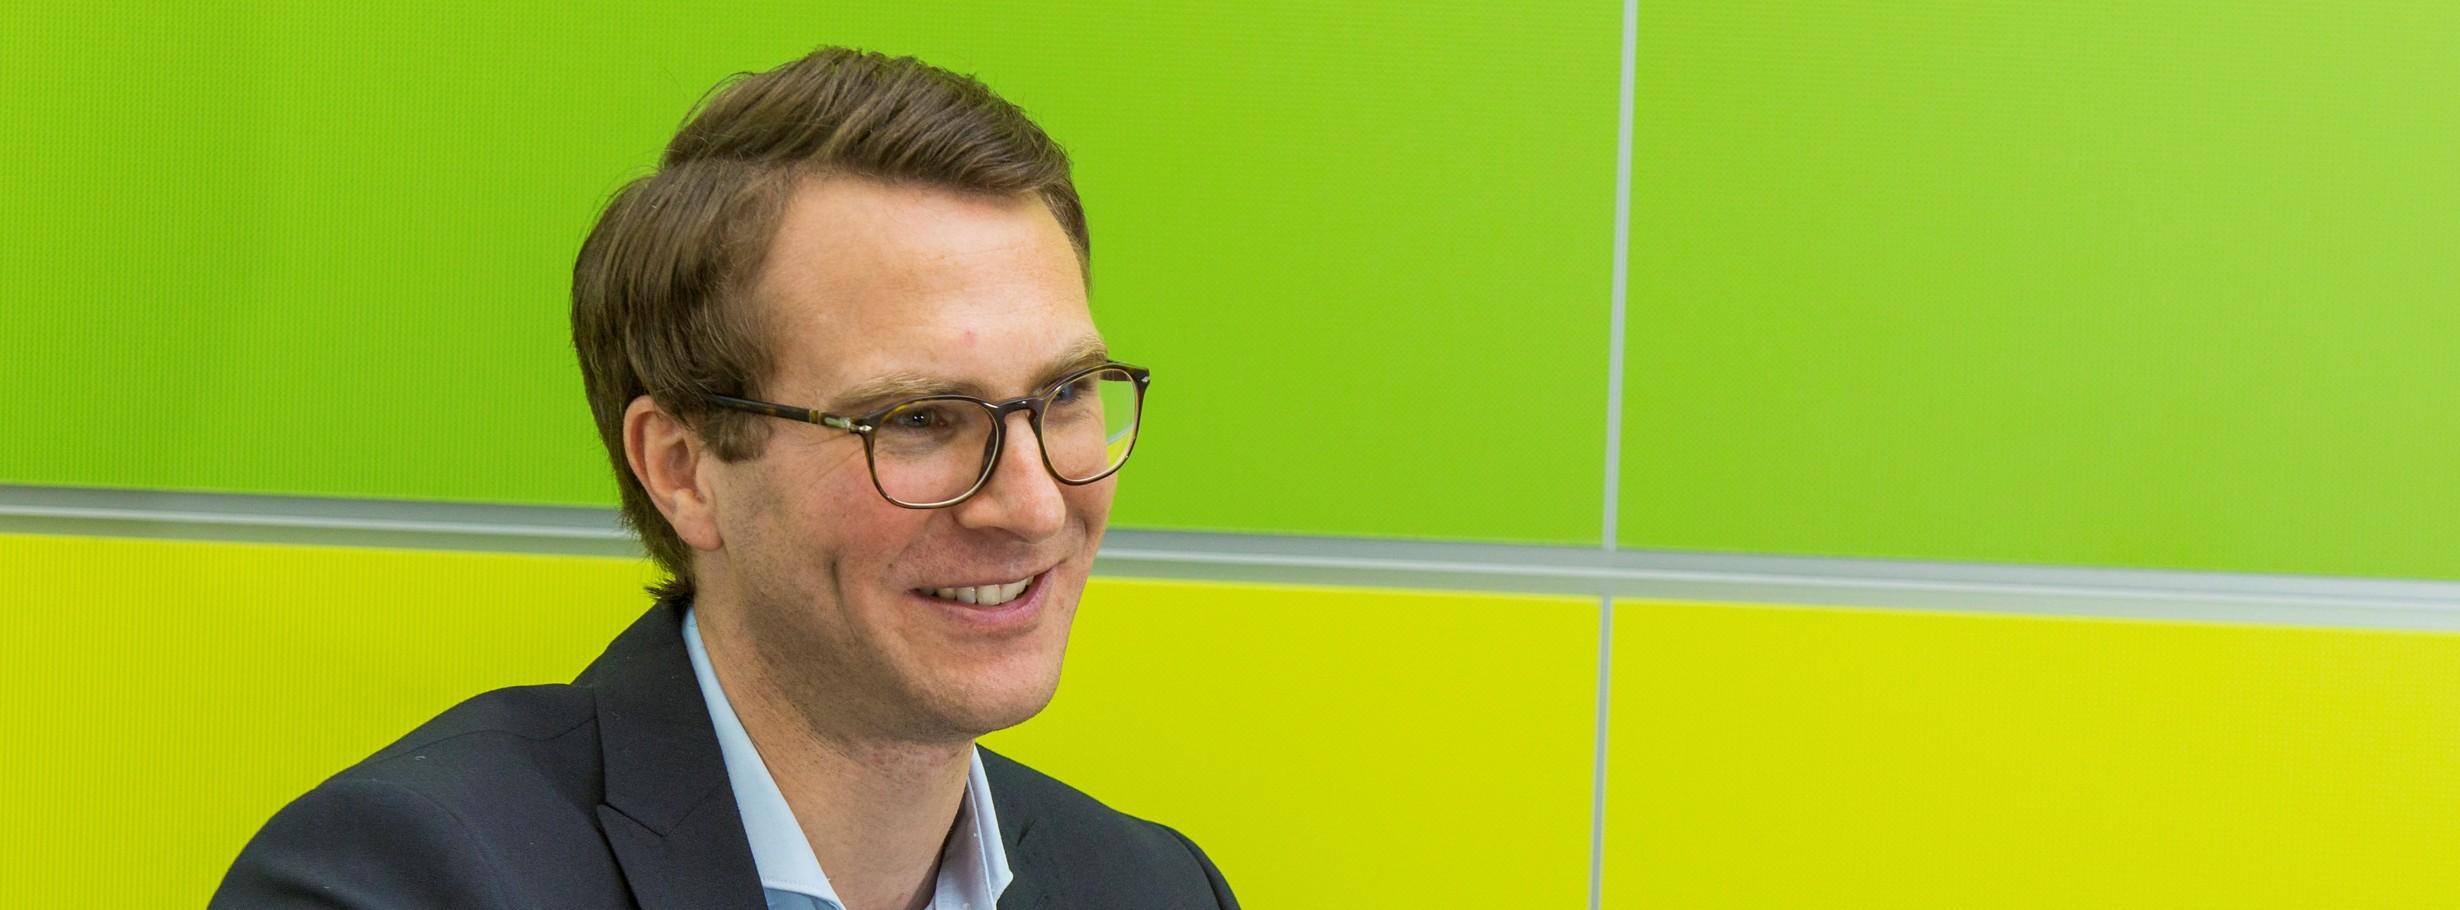 Andreas Lenk